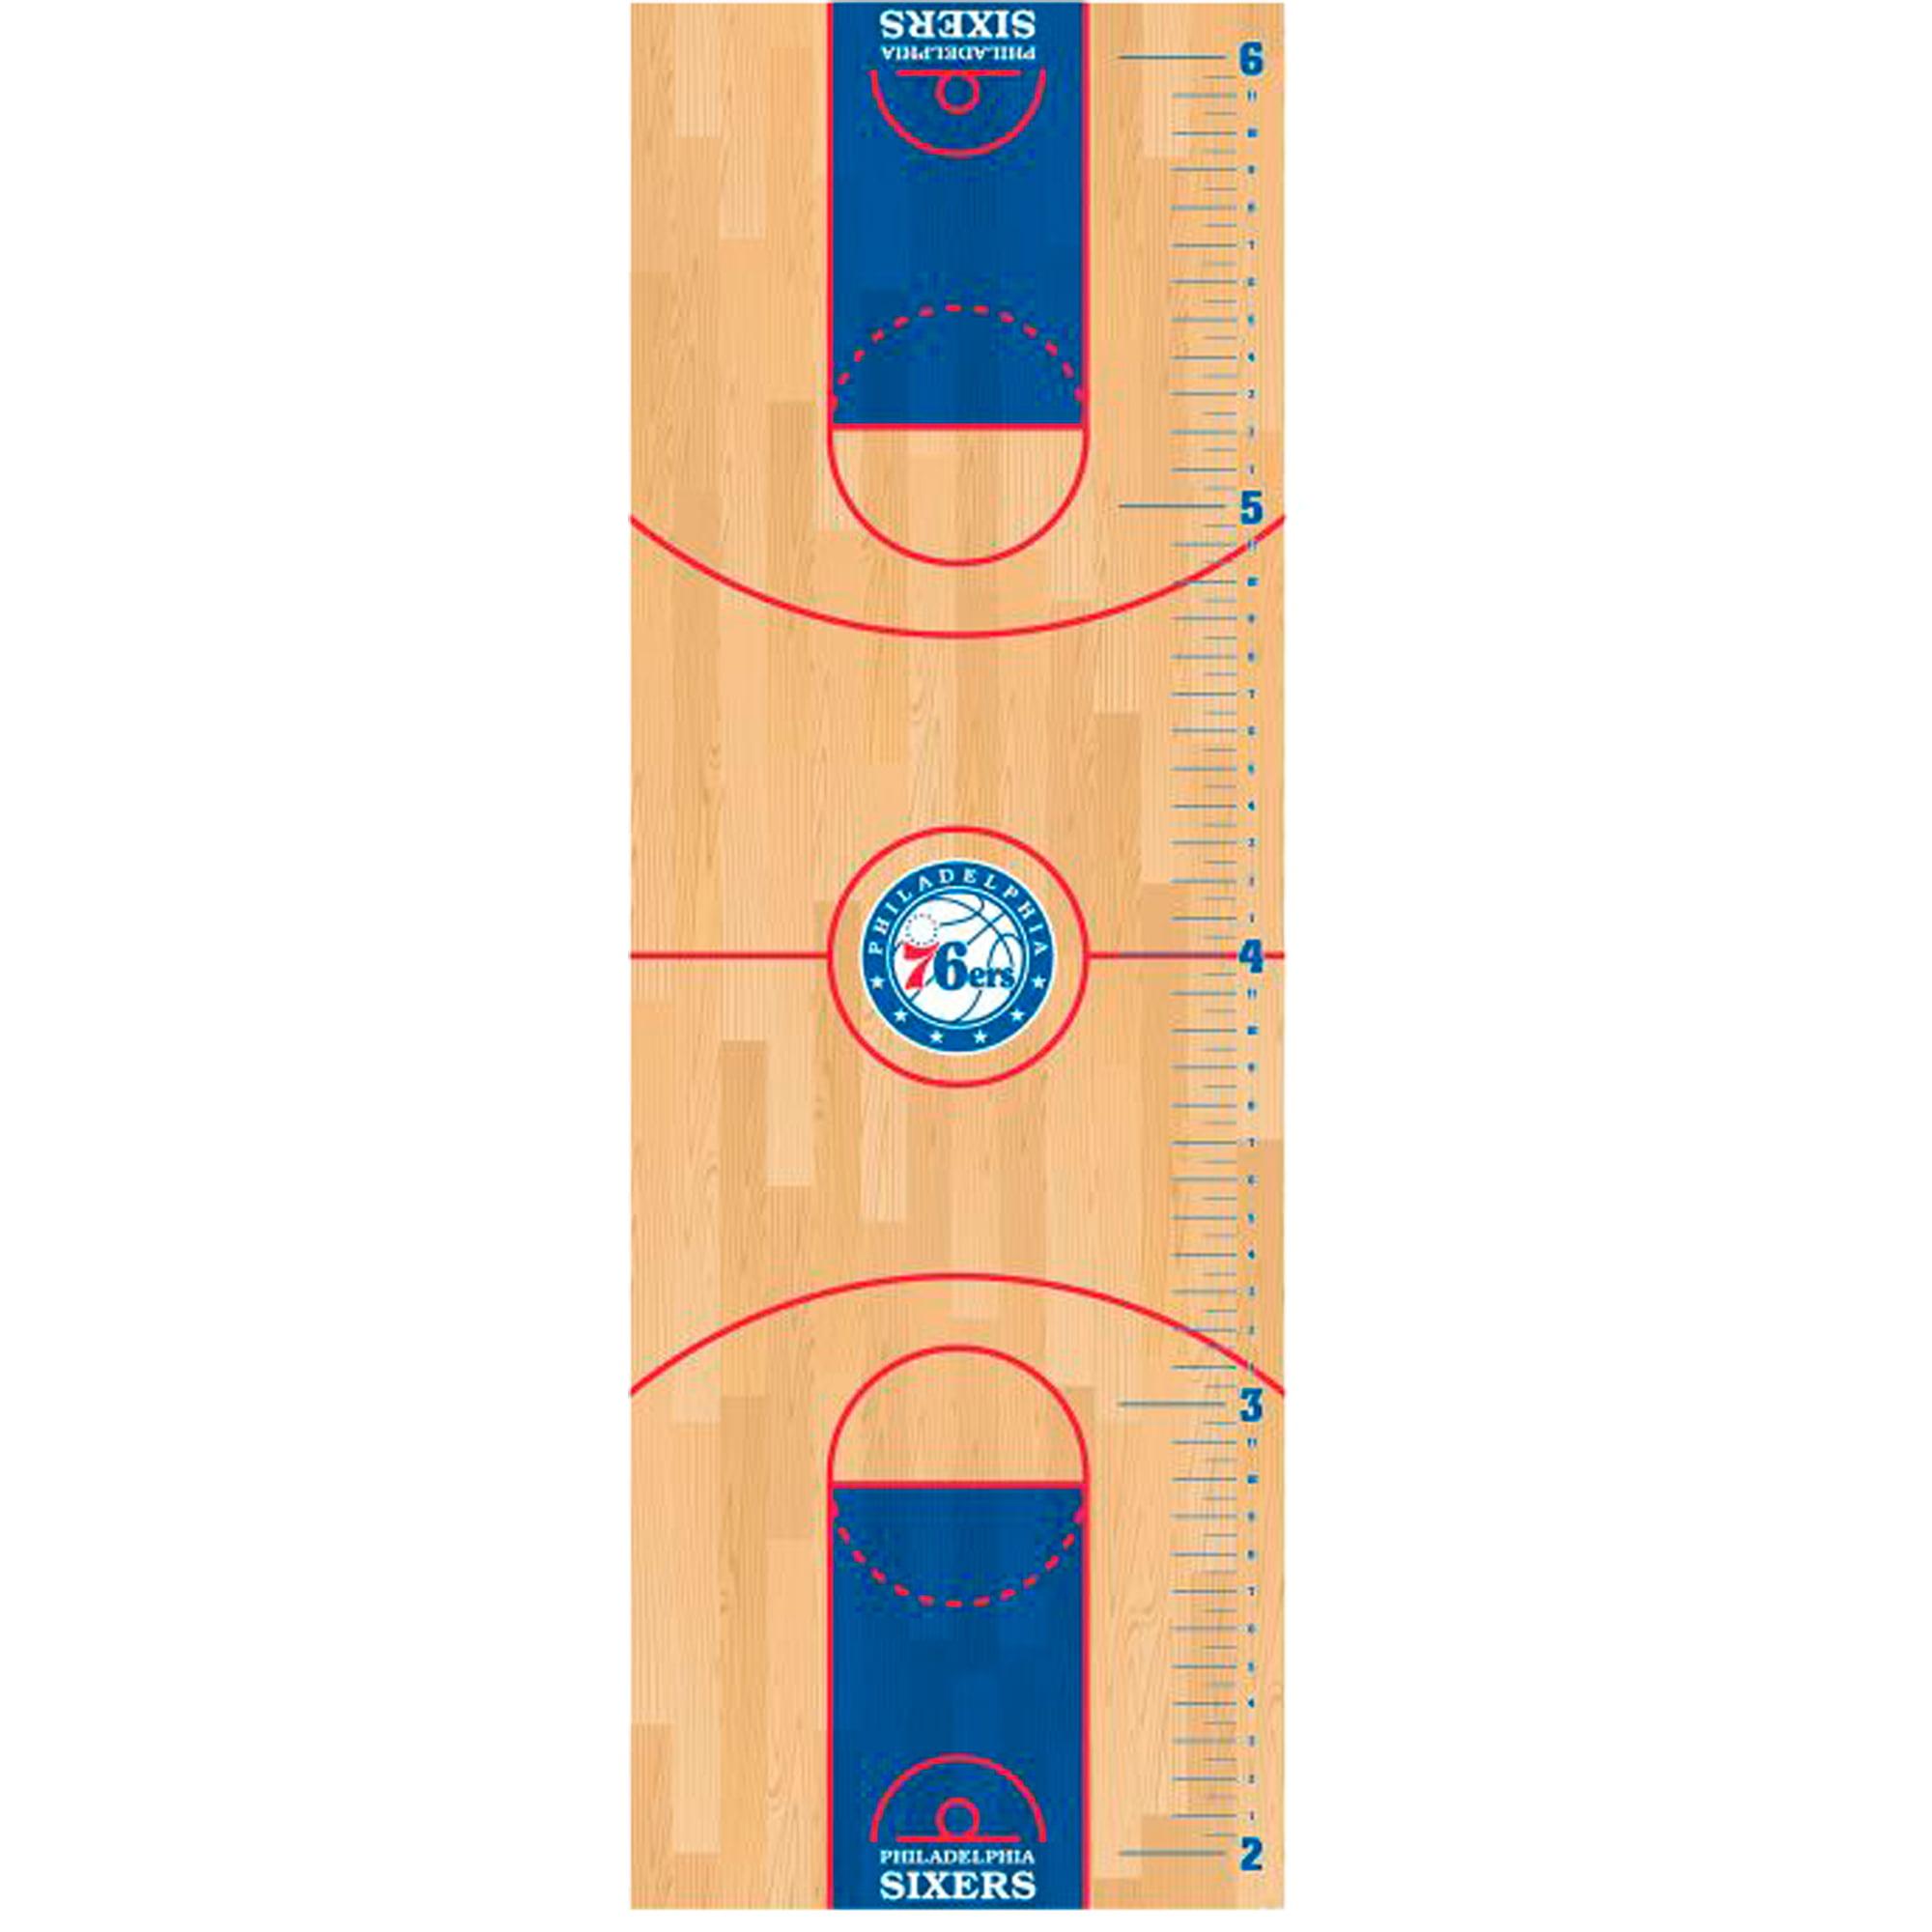 Philadelphia 76ers Fathead Basketball Court Large Removable Growth Chart - No Size